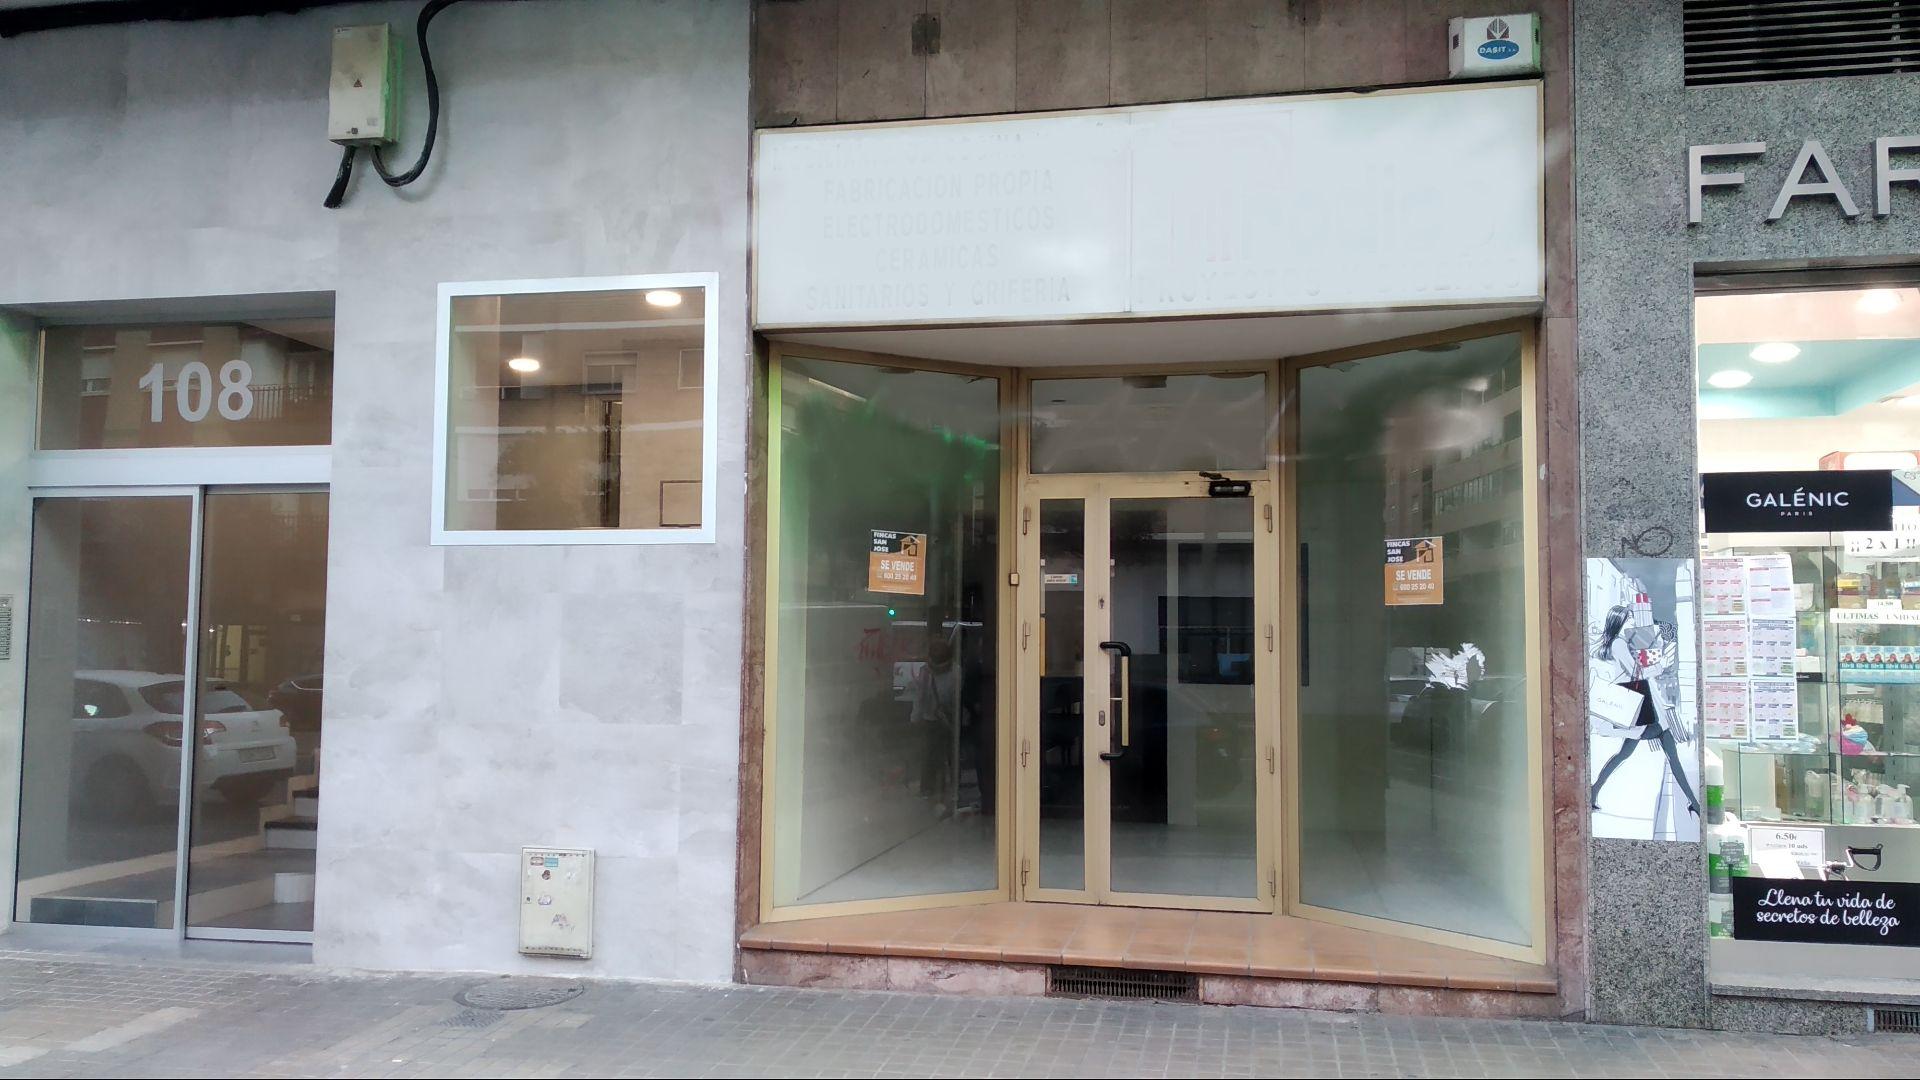 Local comercial en Zaragoza, venta